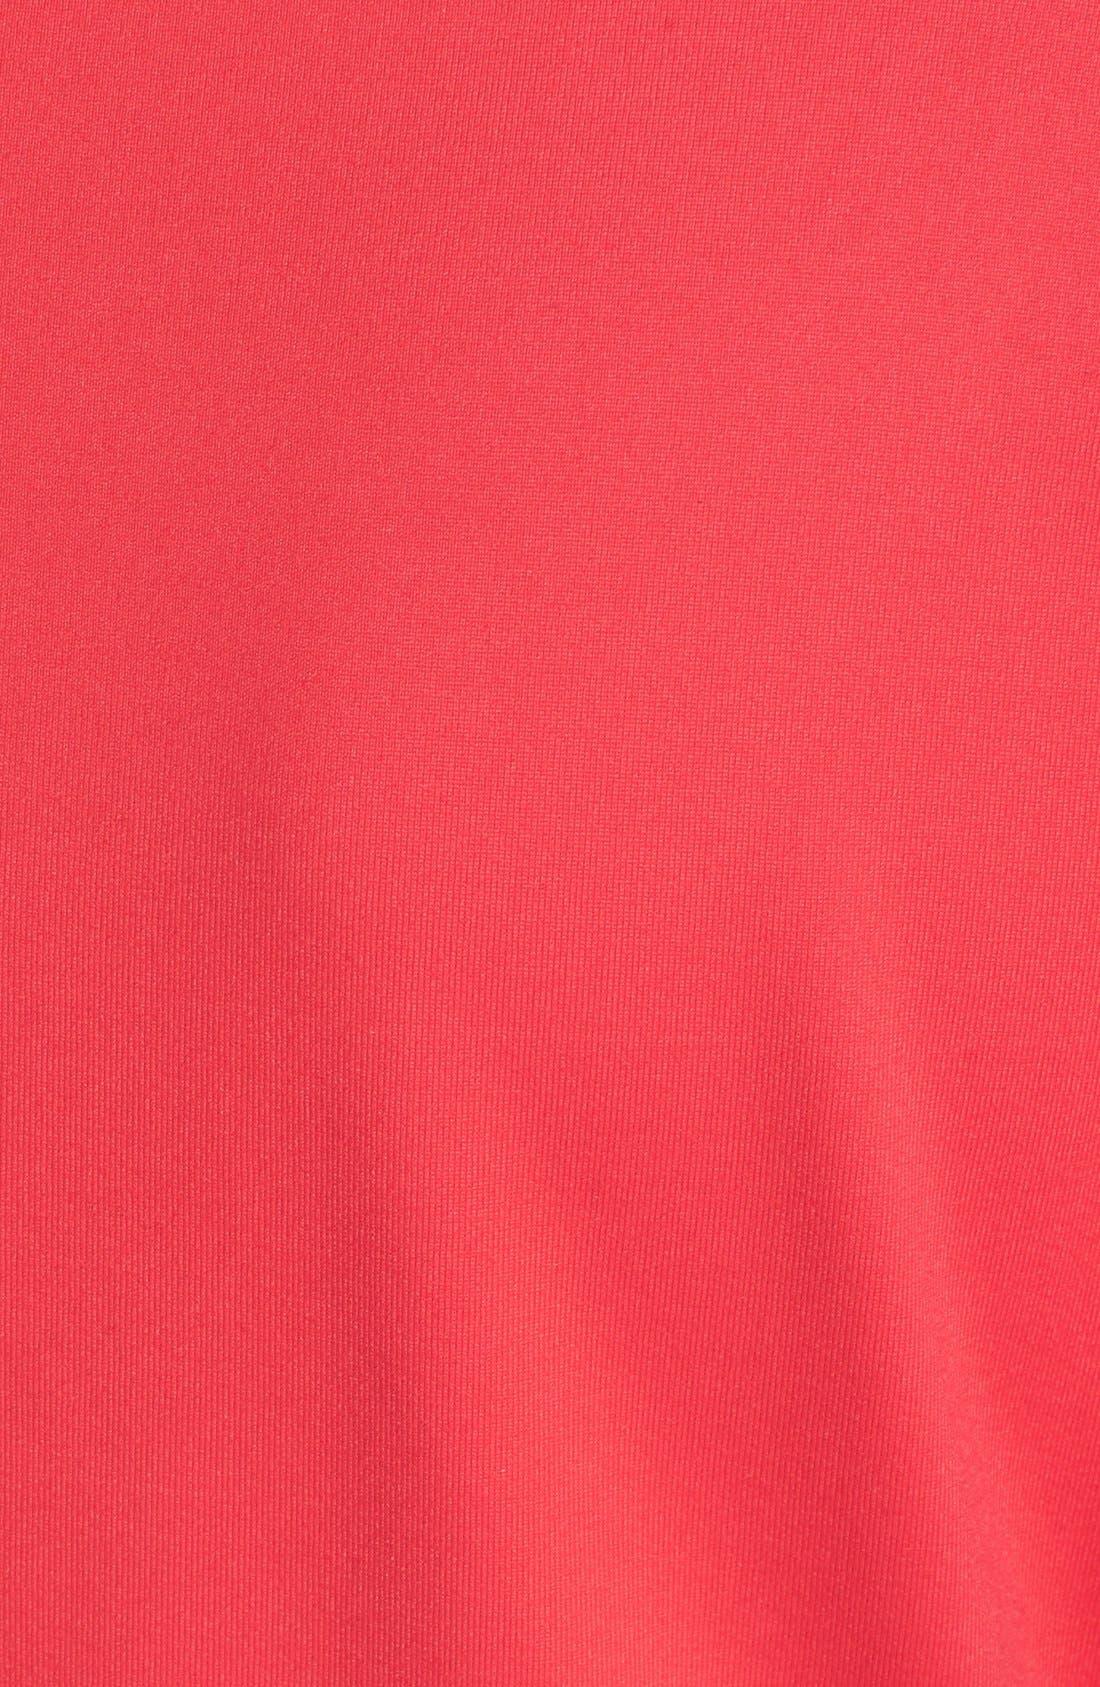 ,                             V-Neck Body-Con Dress,                             Alternate thumbnail 32, color,                             605